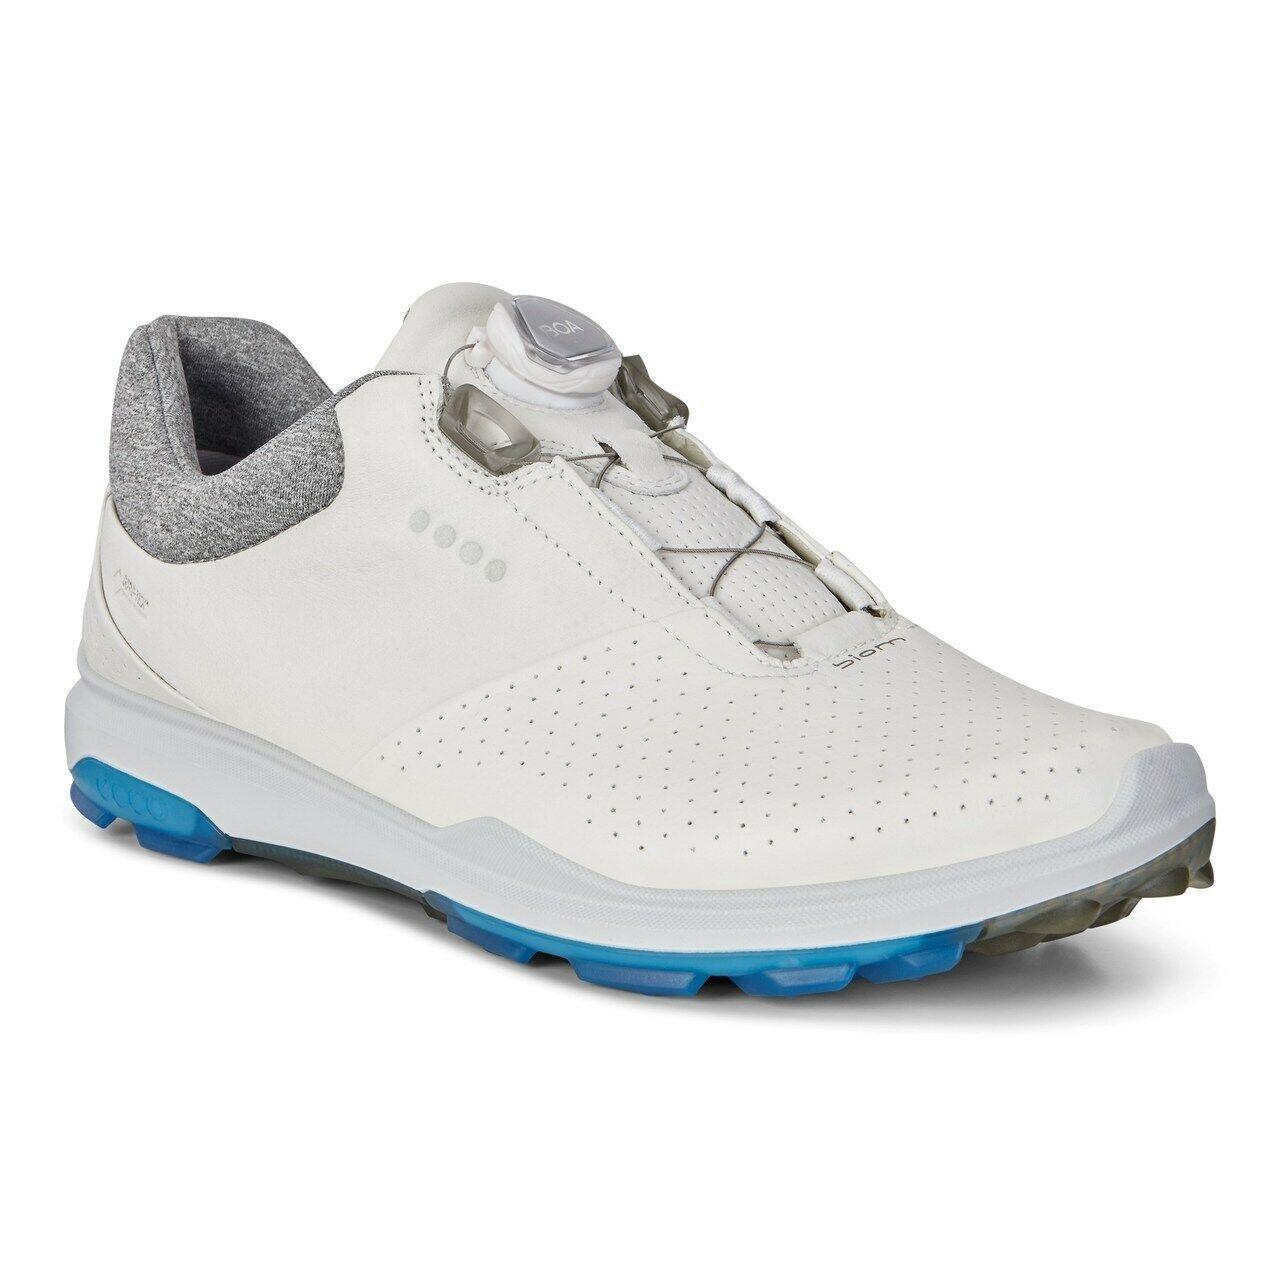 Ecco Mens Biom Hybrid 3 Golf Shoes White Dynasty For Sale Online